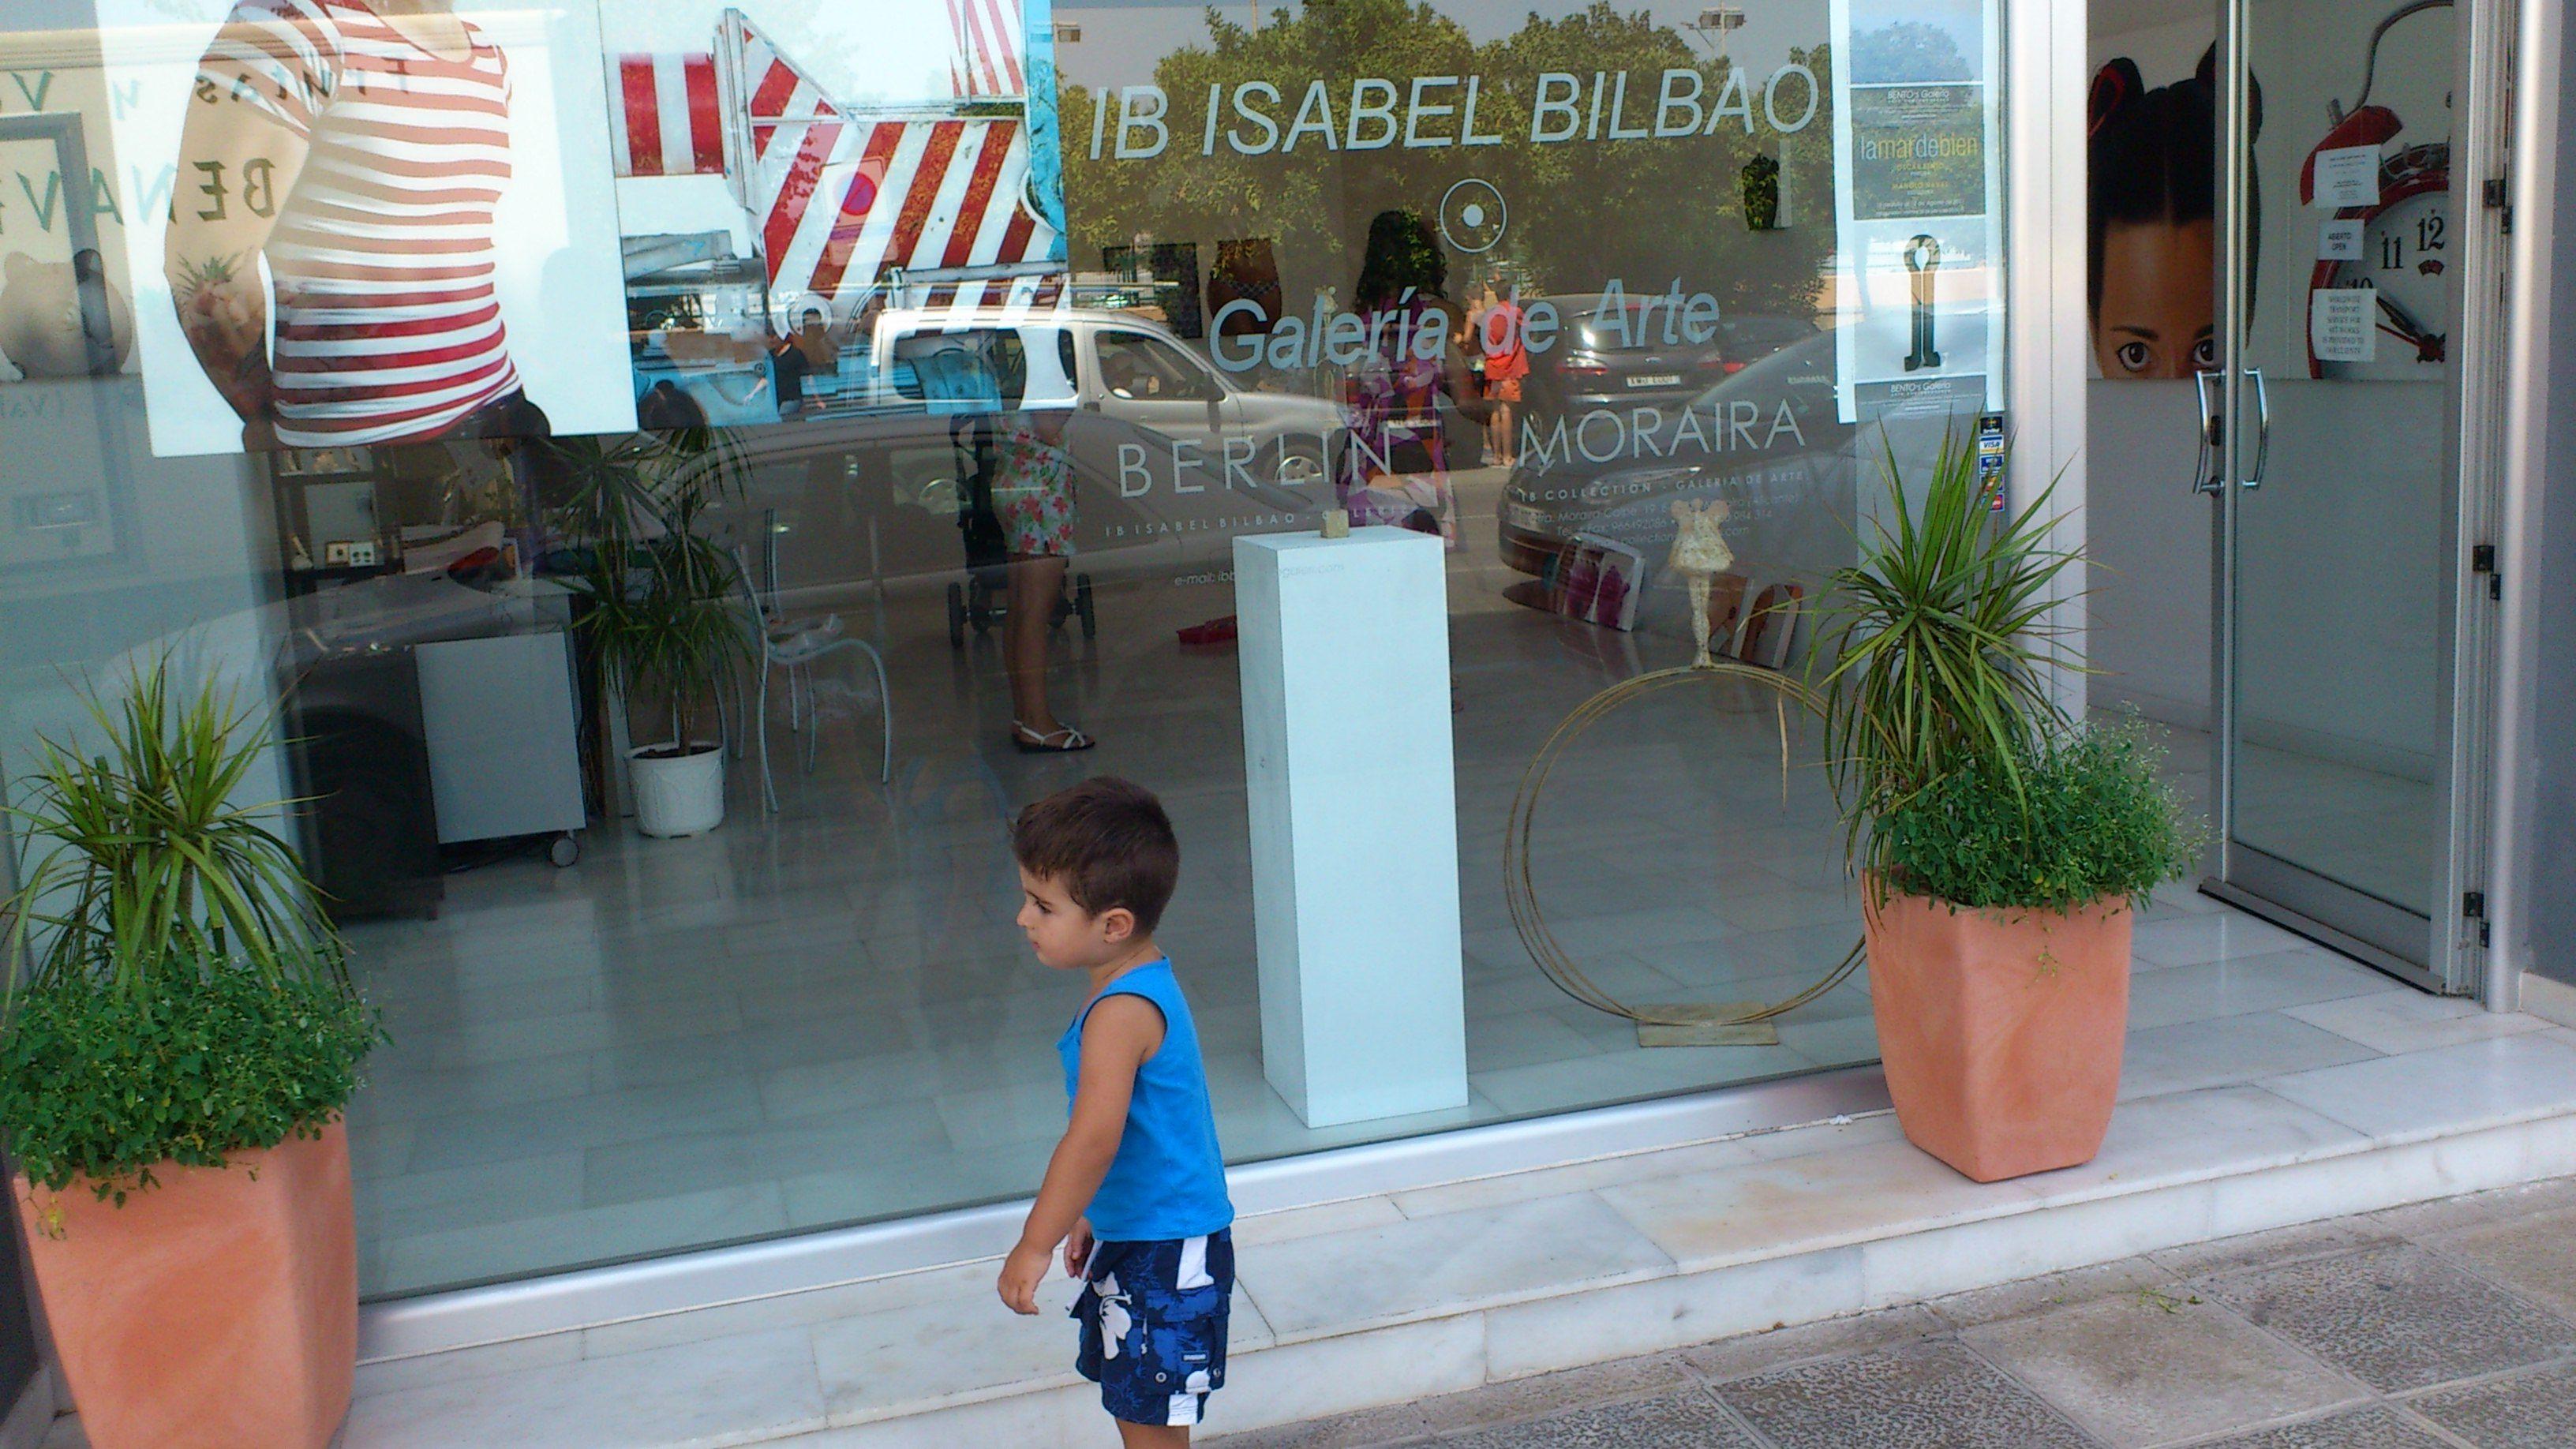 Gallery Isabel Bilbao, Moraira 2011